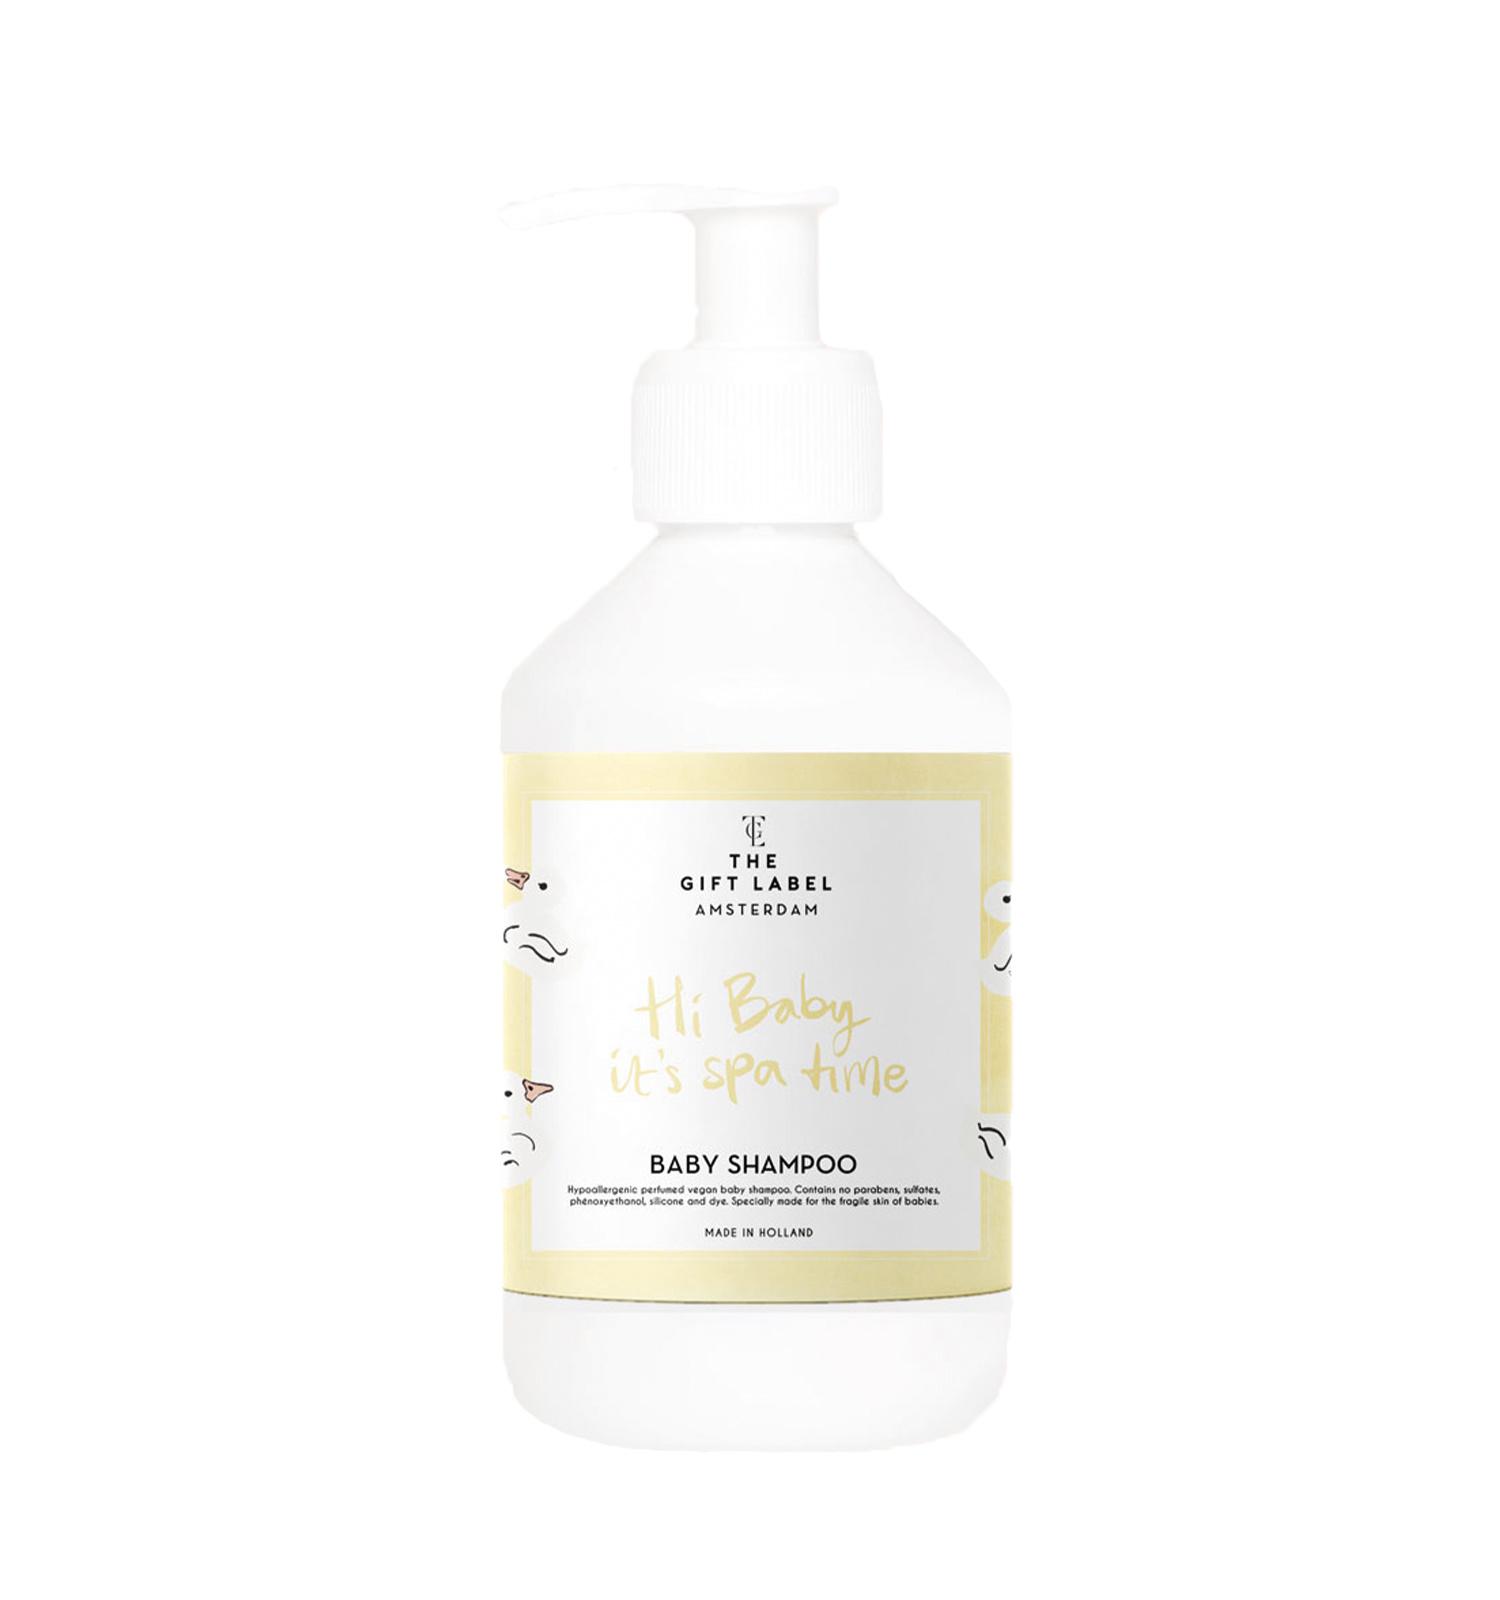 THE GIFT LABEL Baby shampoo 250 ml | Hi baby